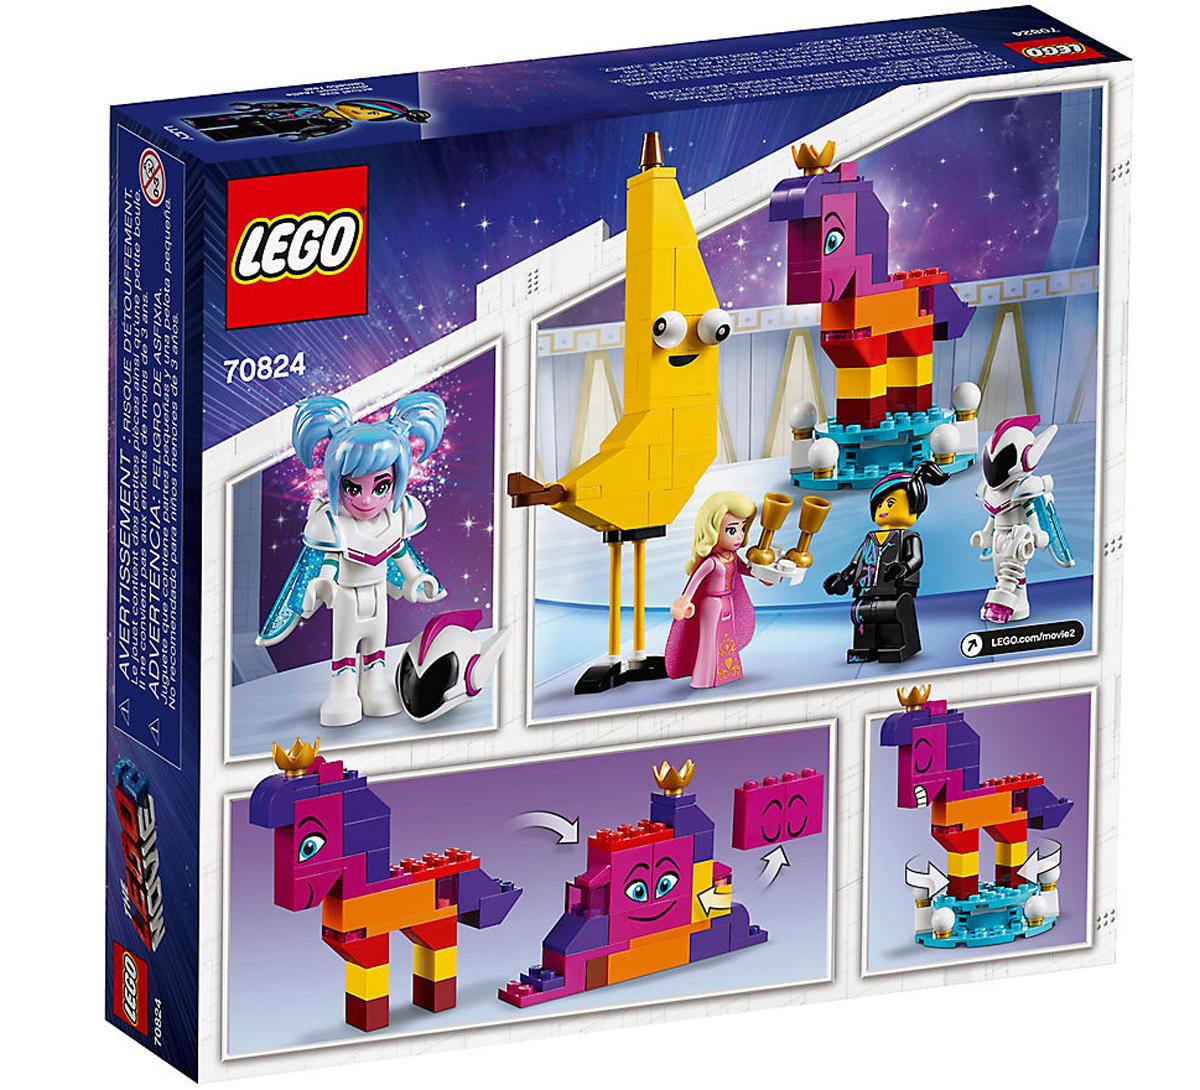 The Lego Movie 2 S Sweet Mayhem Alternate Figure Revealed